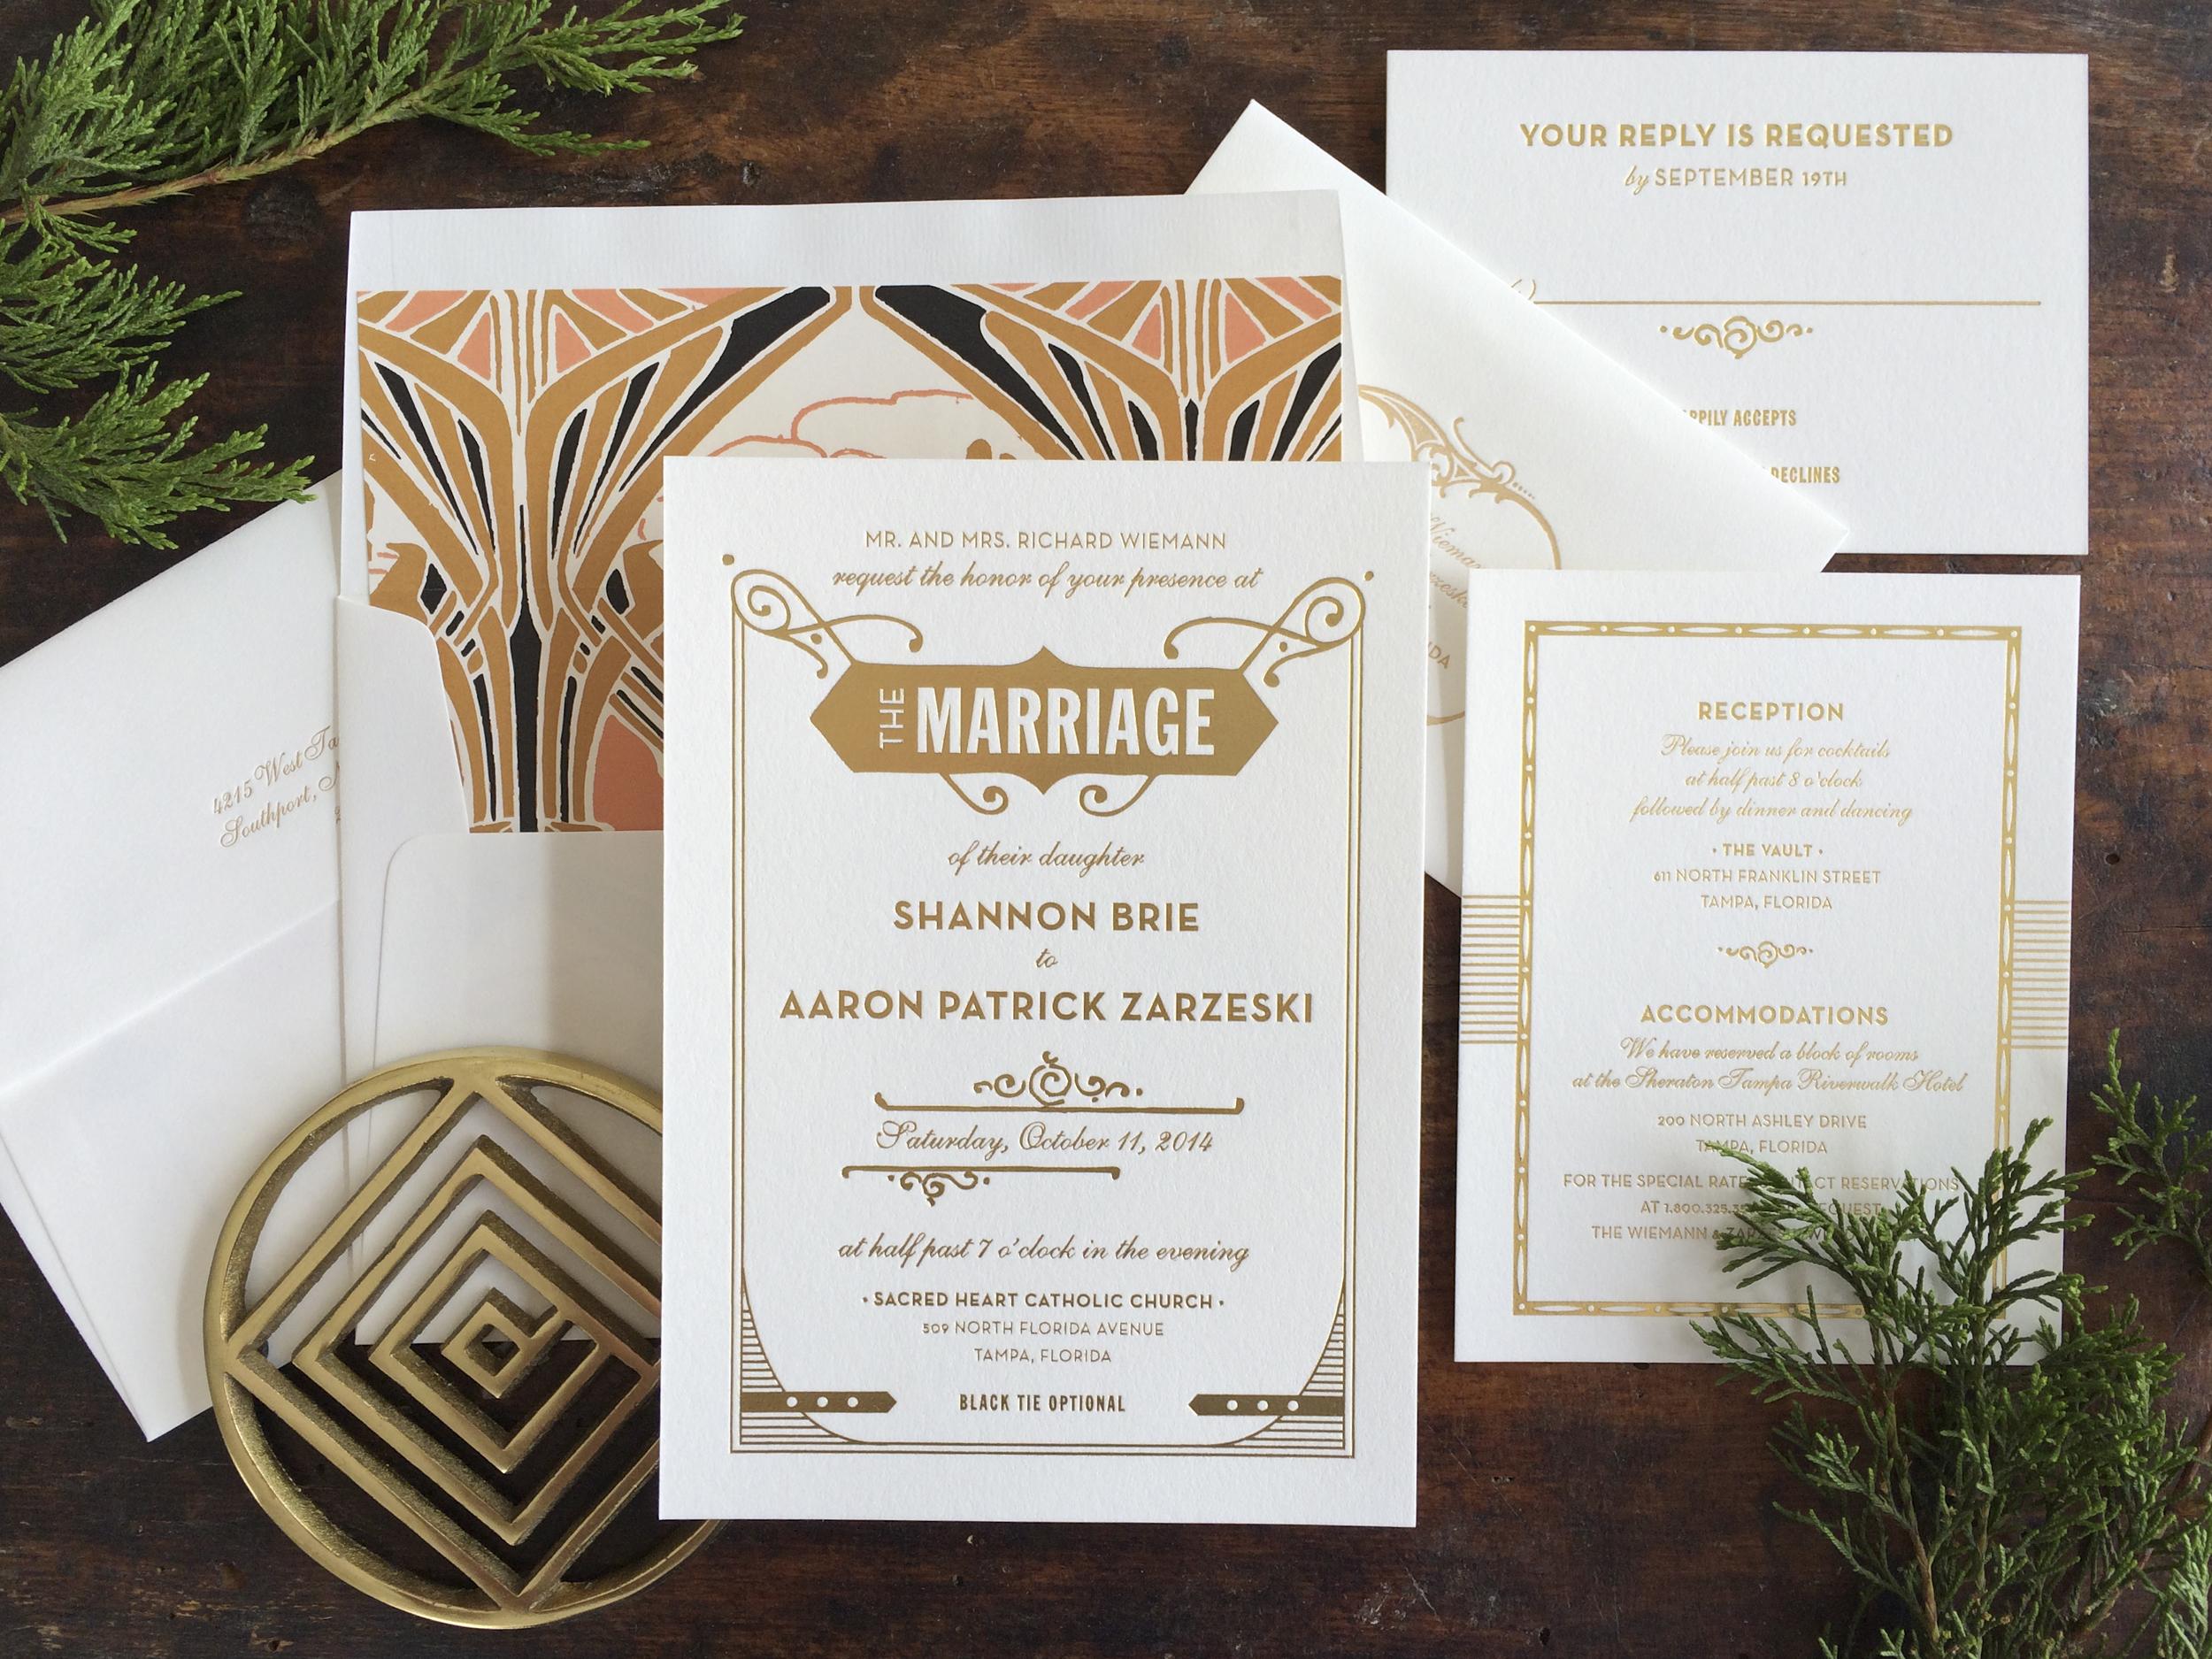 gatsby-gold-foil-letterpress-wedding-invitation.jpg